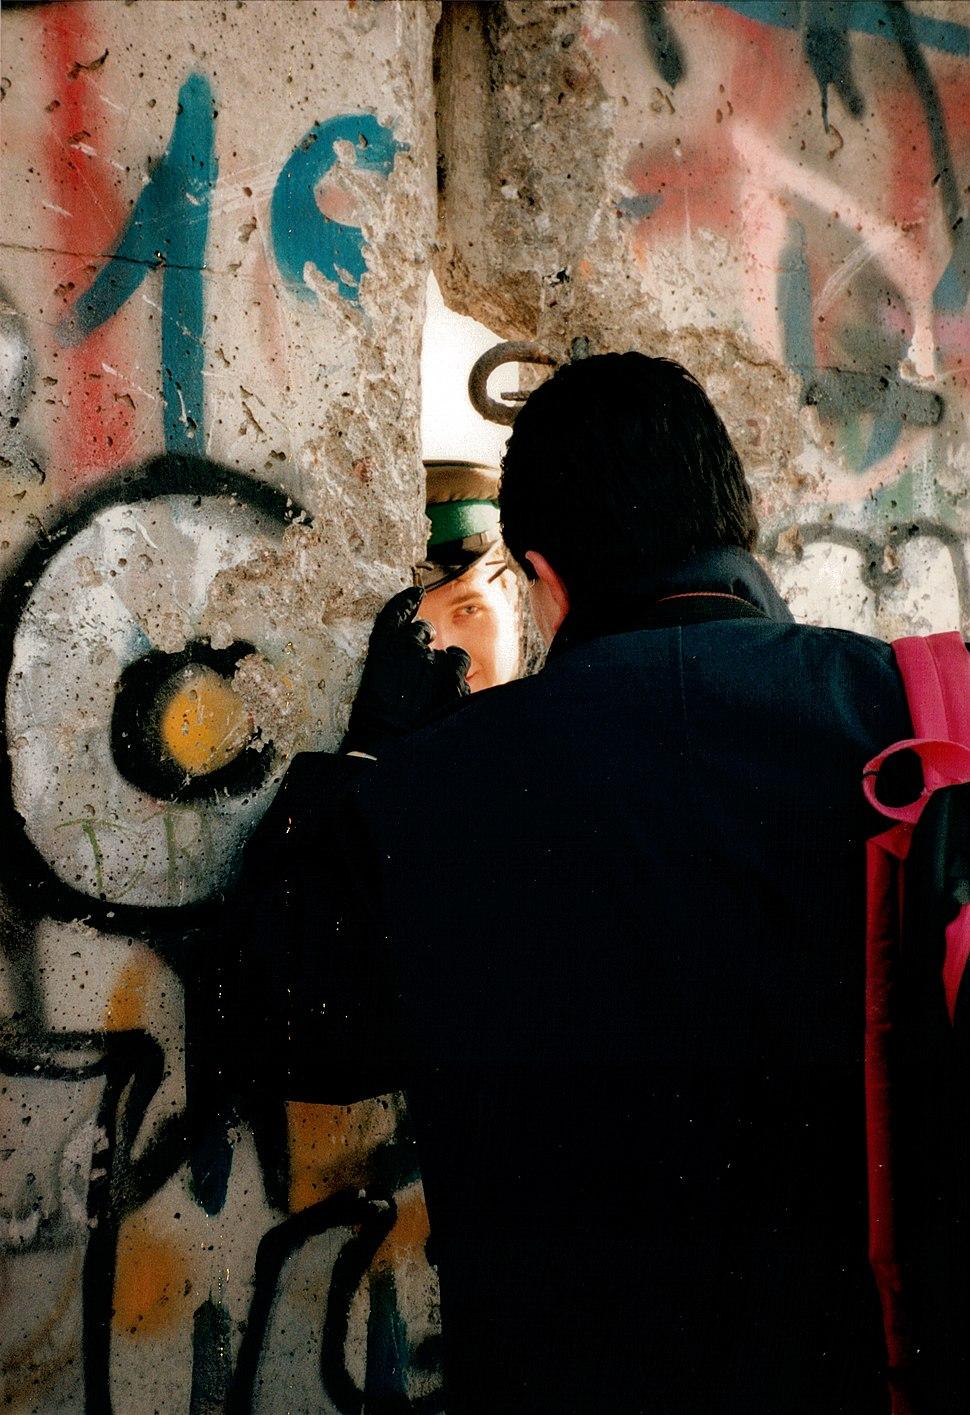 Berlin fallofwall emerson.jpg